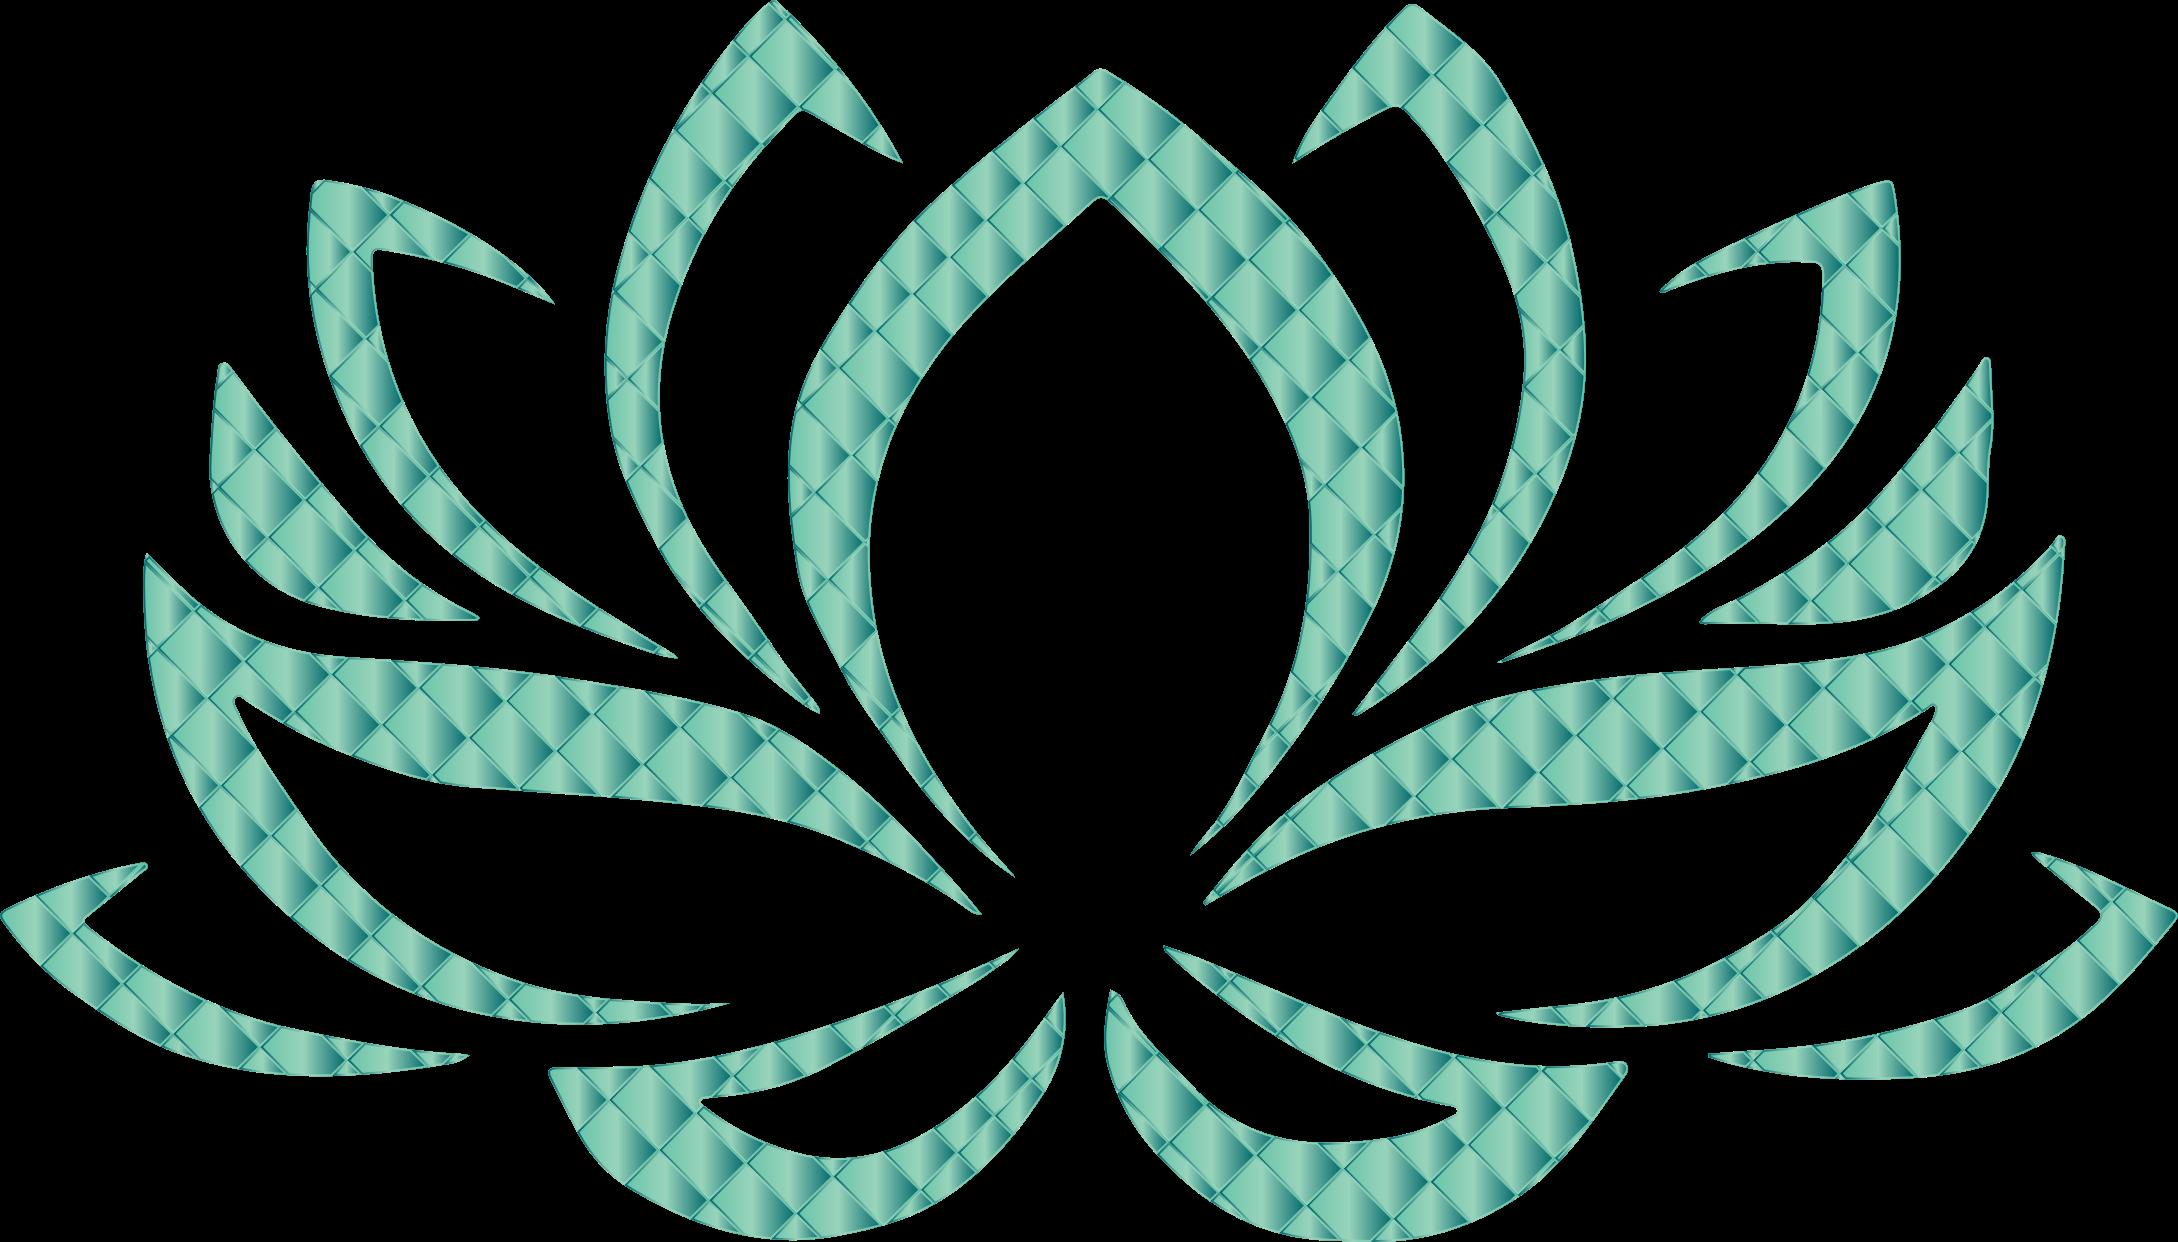 Teal flower clipart clip art library Clipart - Jade Lotus Flower No Background clip art library